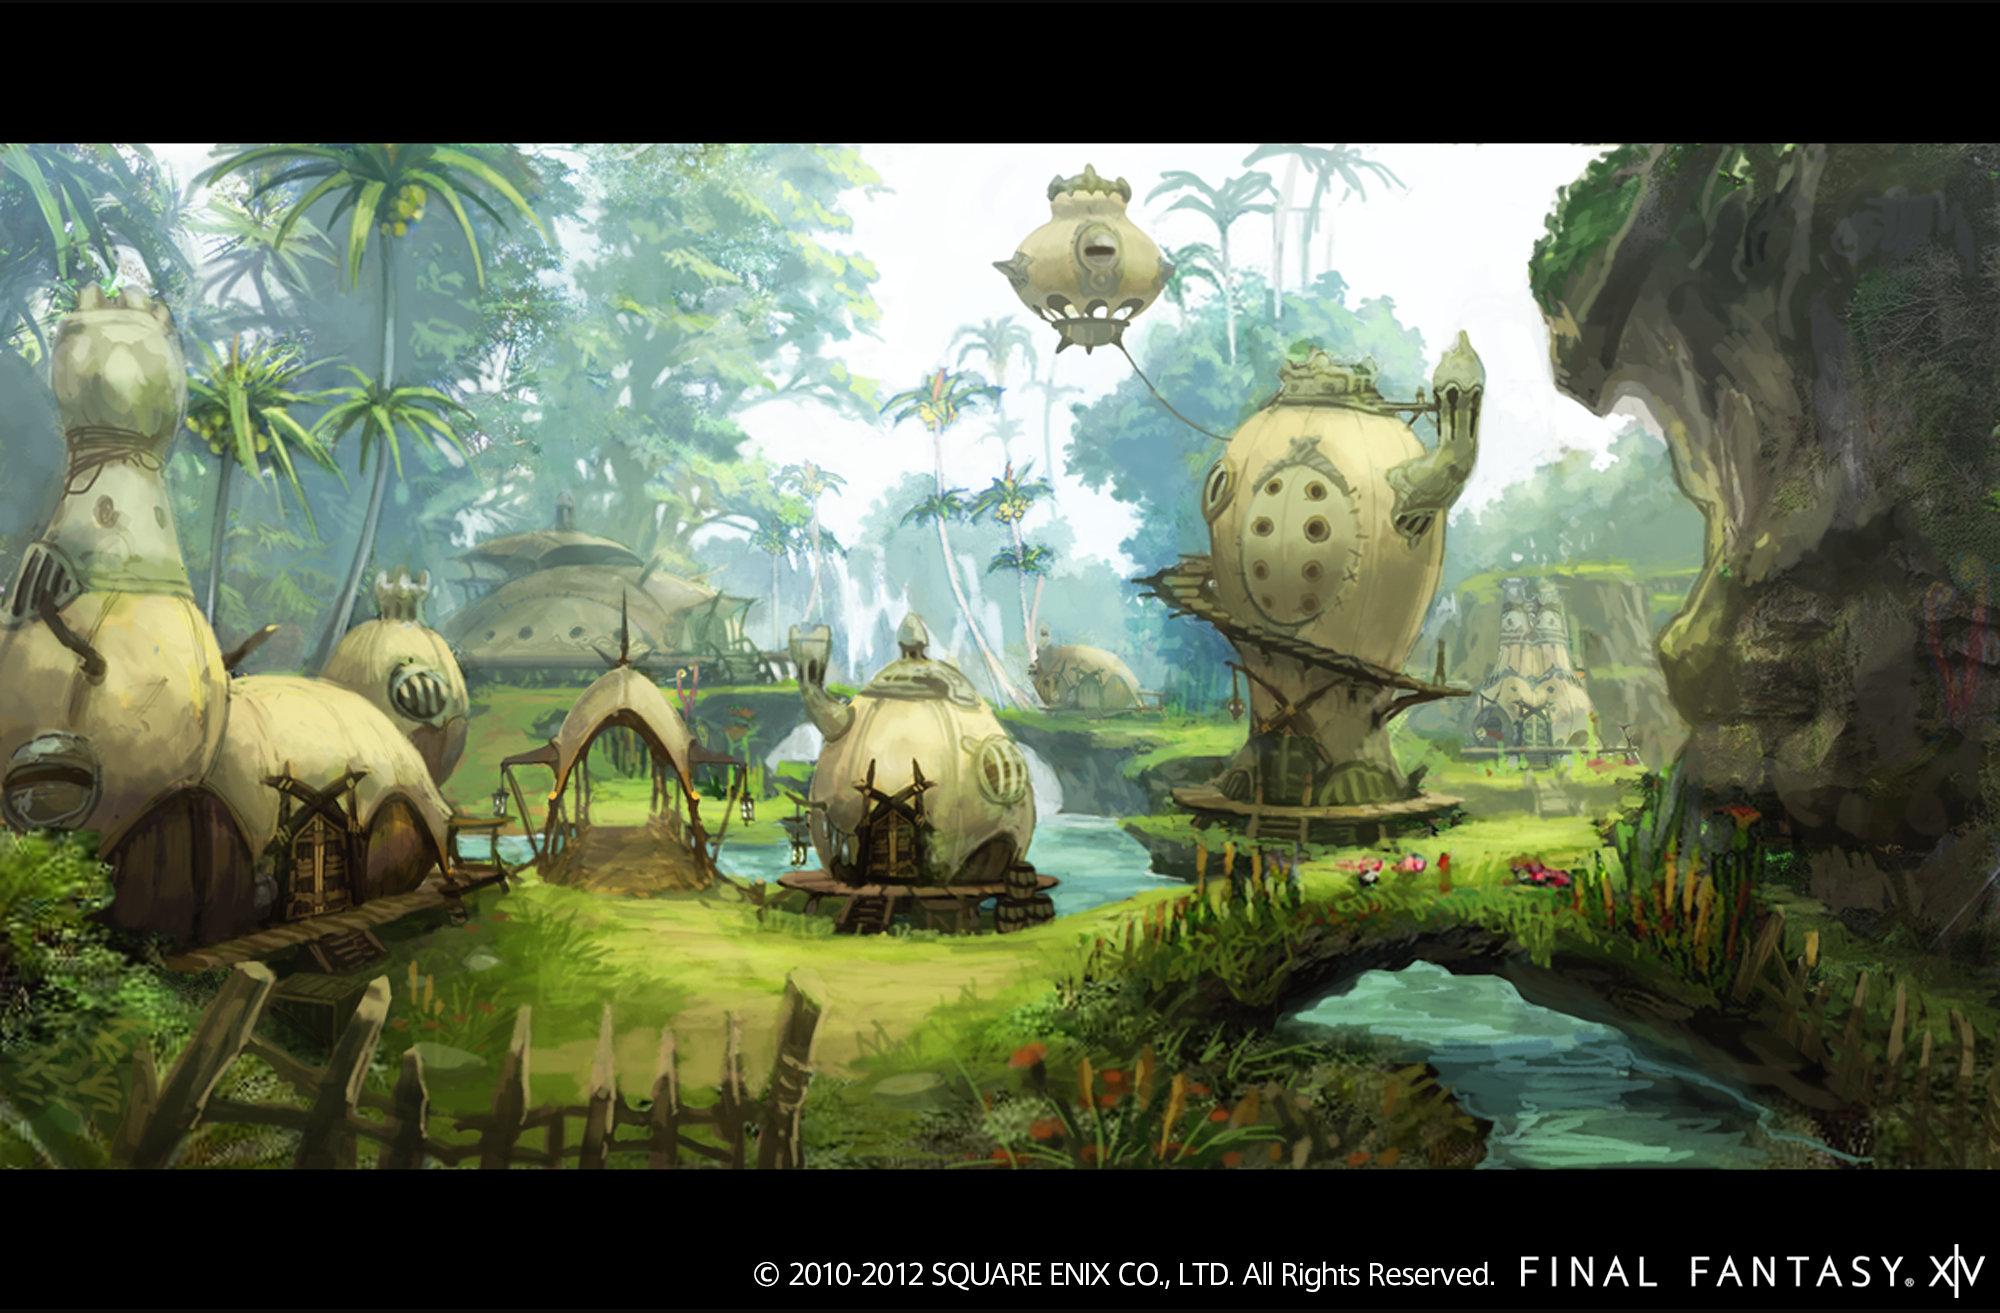 Fantasy XIV A Realm Reborn Computer Wallpapers Desktop Backgrounds 2000x1313